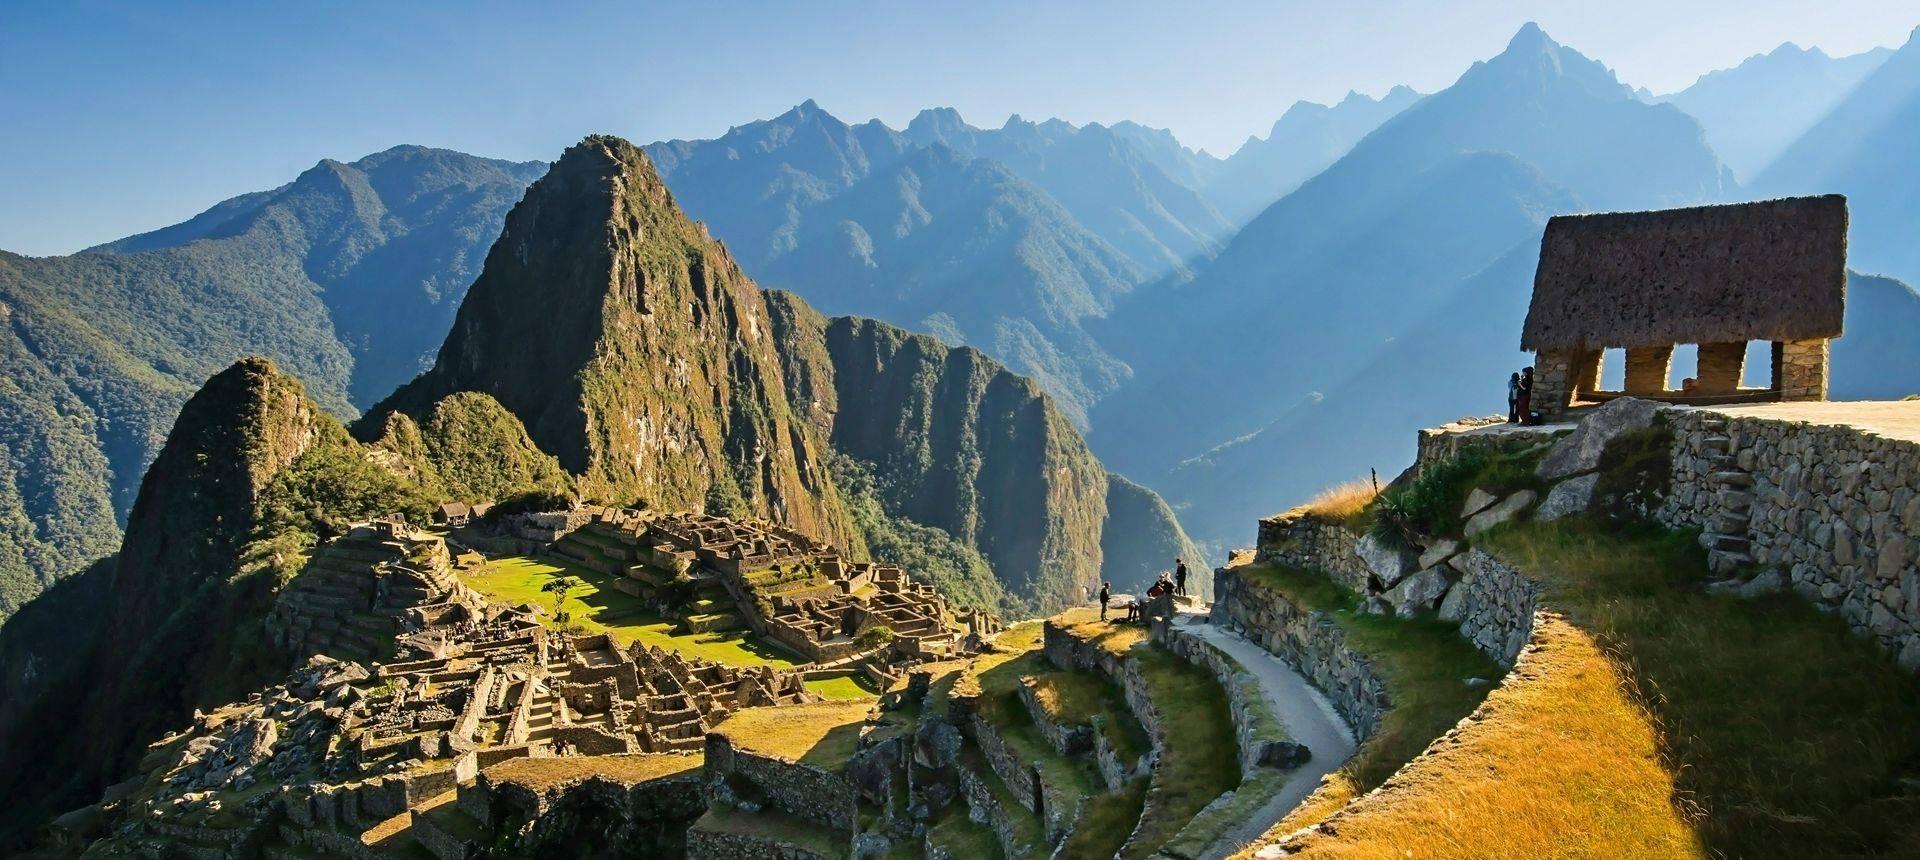 Trekking, Machu Picchu Shutterstock 357556679